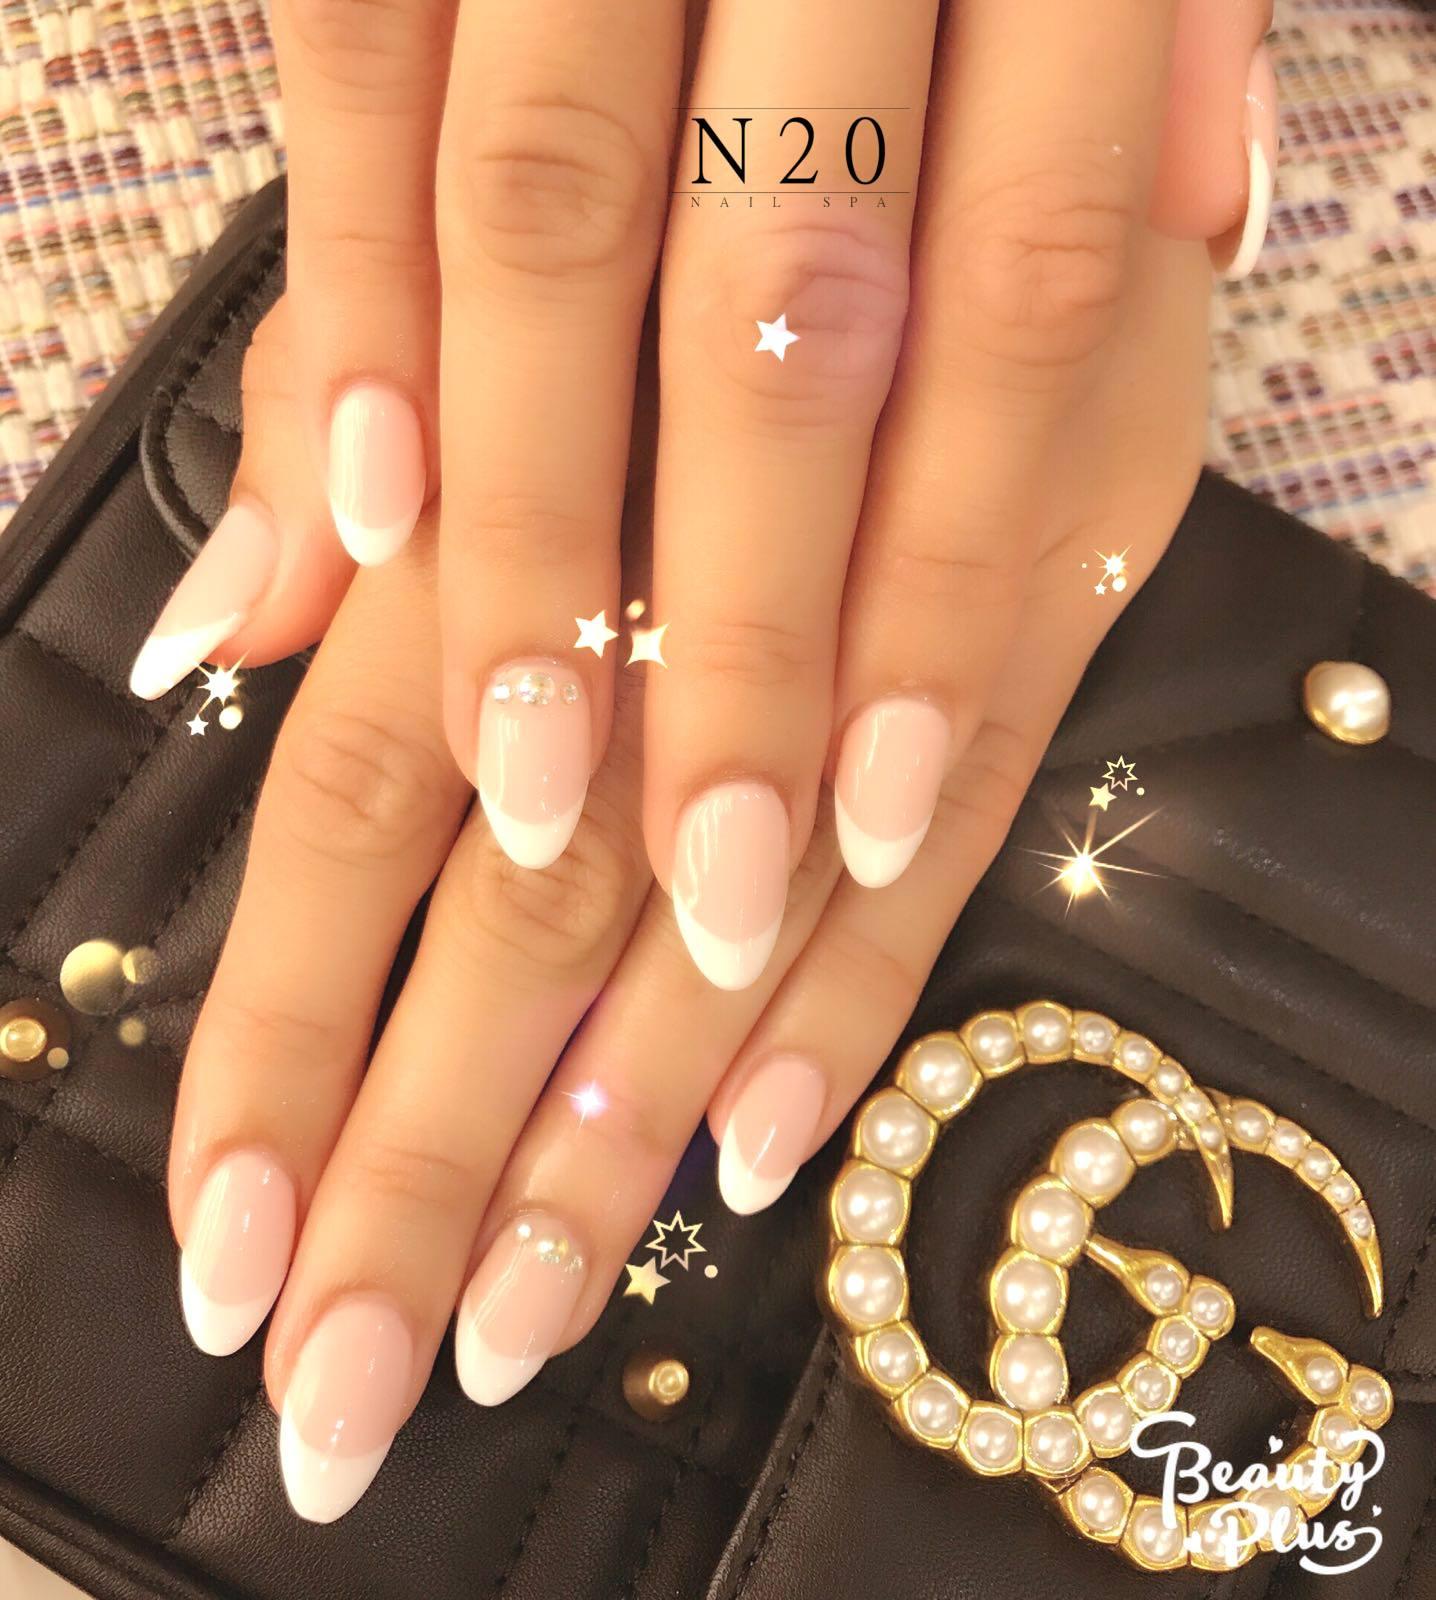 Classic Petite clear glossy shaped nail manicure - N20 Nail Spa